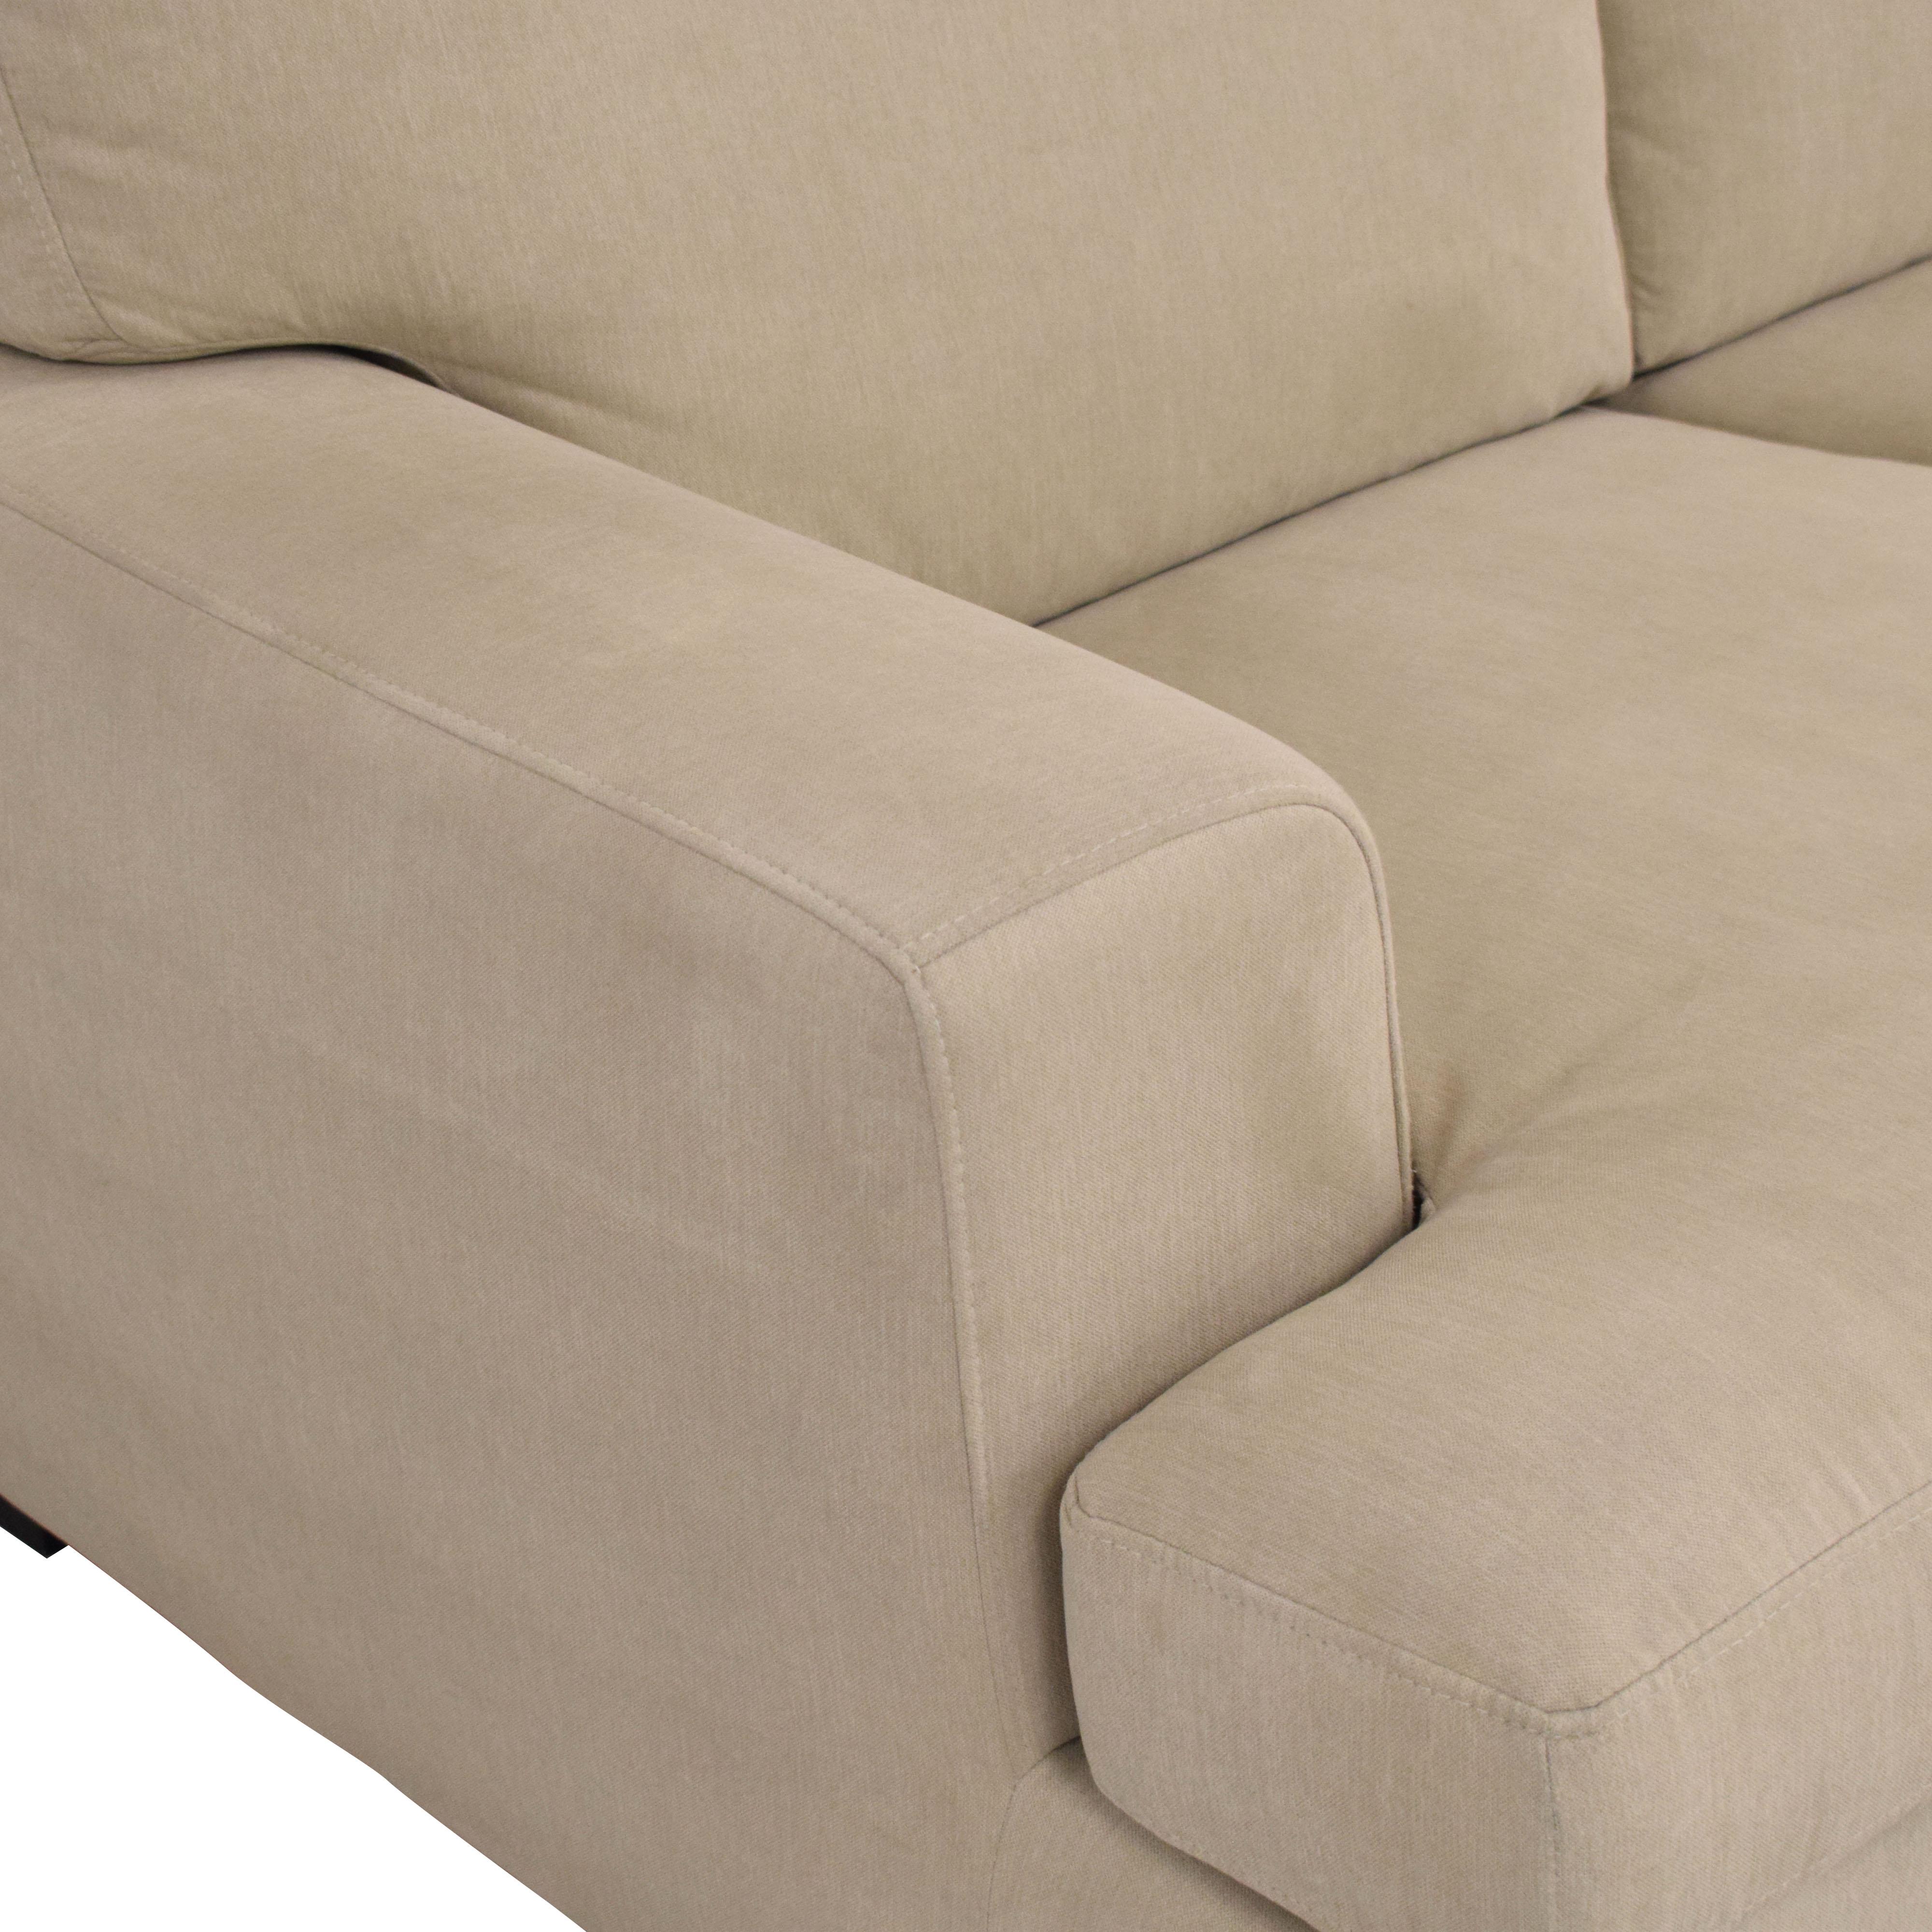 Stone & Beam Stone & Beam Lauren Down-Filled Oversized Sofa beige